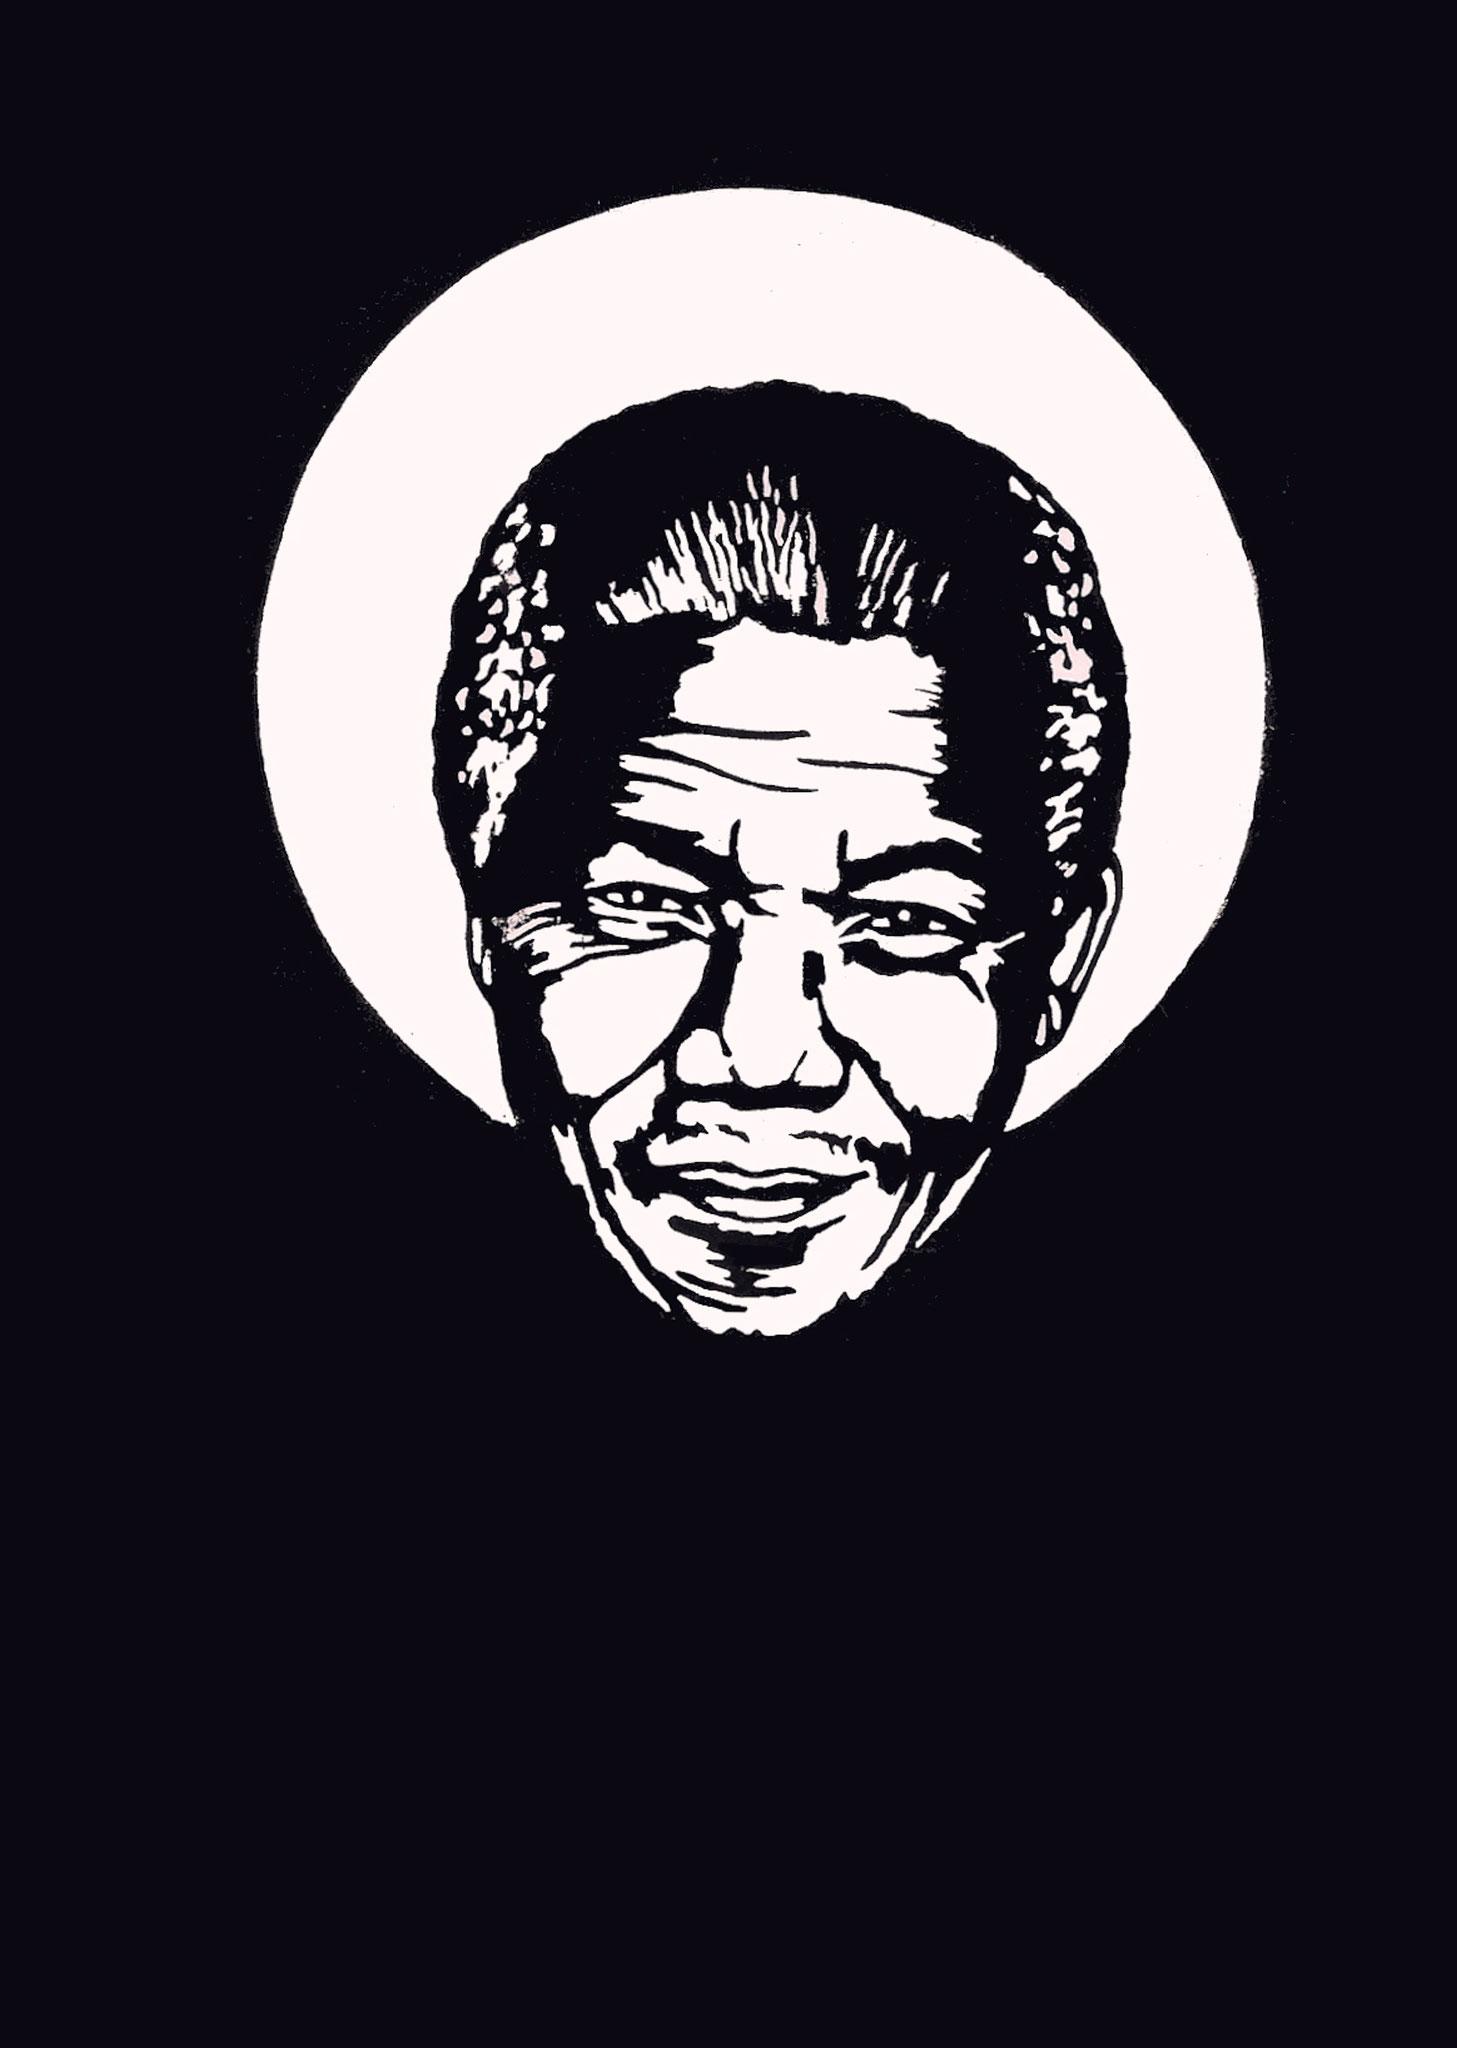 Nelson Mandela, 12/11/2017, Edition 5, A5